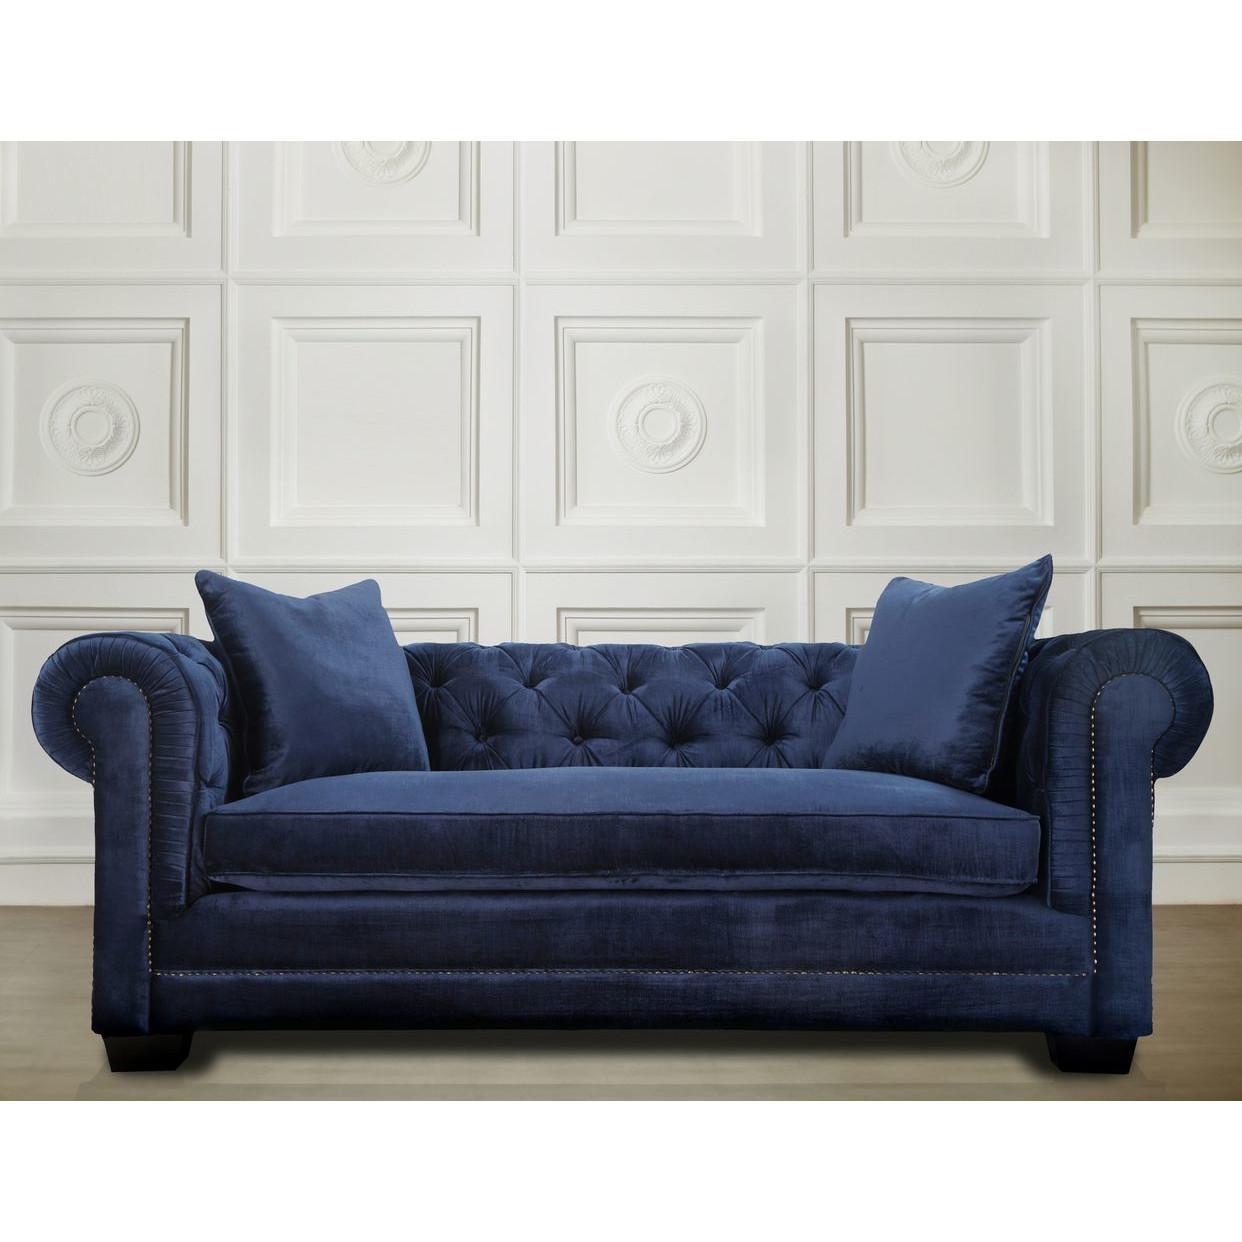 Chair Norwalk Furniture Norwalkcustom Twitter Deacawtu0A Norwalk Regarding Norwalk Sofa And Chairs (Image 7 of 20)